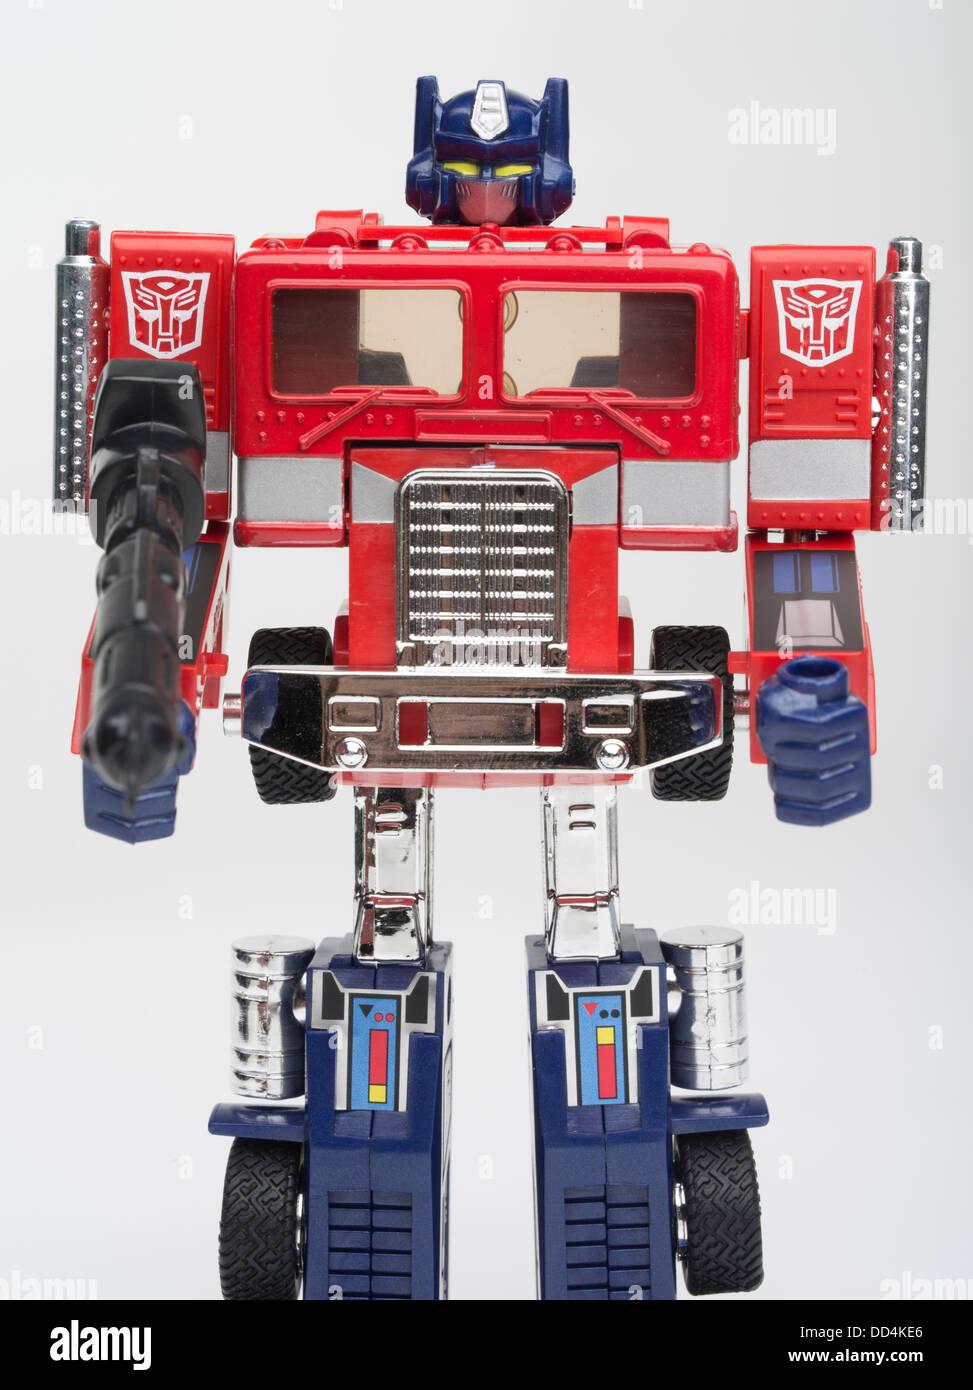 Optimus prime transformers toy by takara takara tomy hasbro first generation 1984